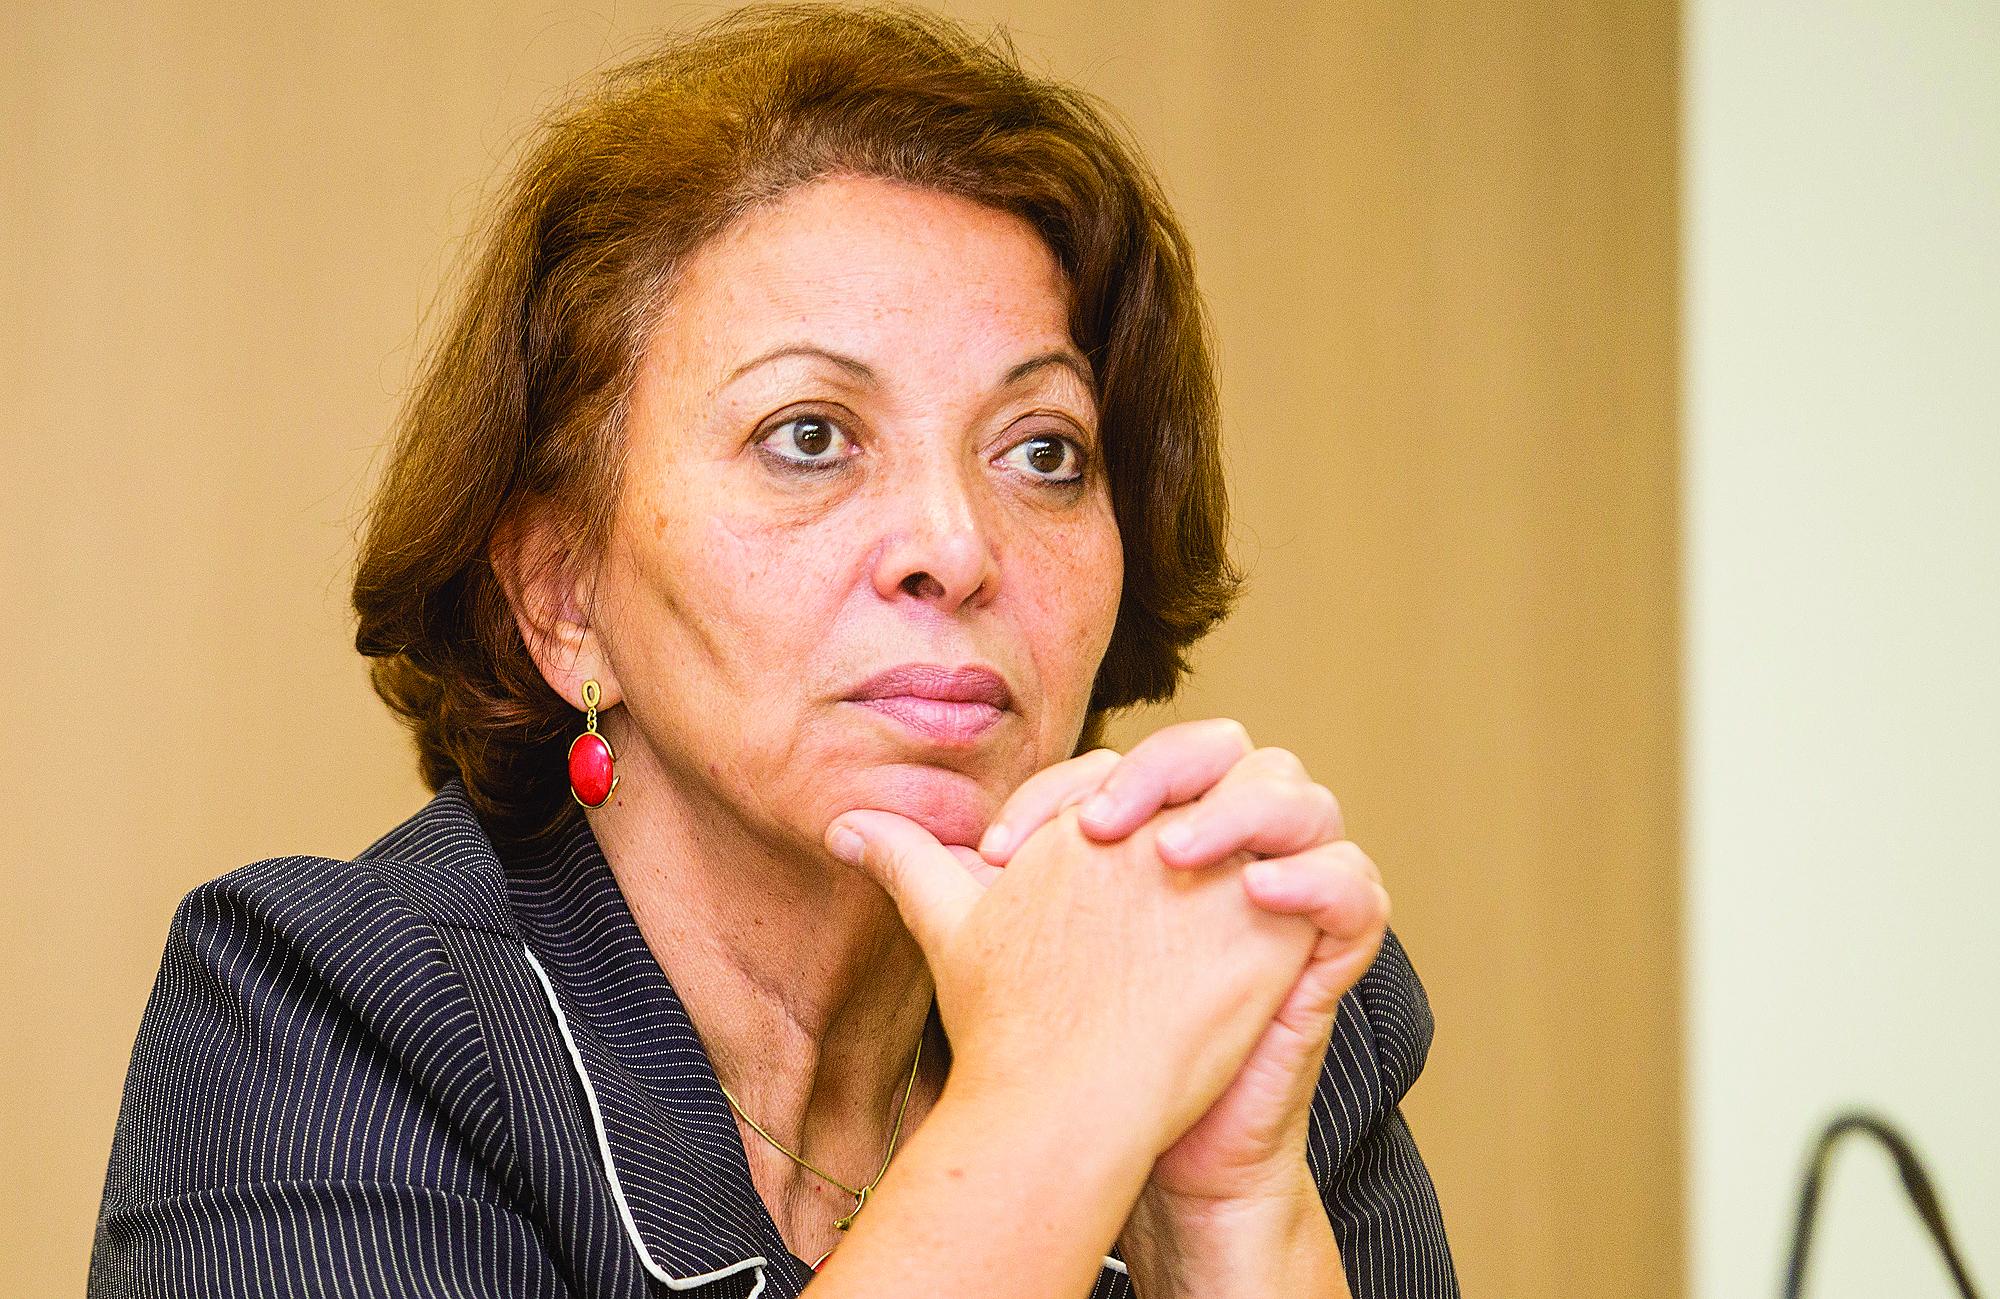 Ideli Salvatti recebeu multa em carreata no valor de R$ 5,8 mil.